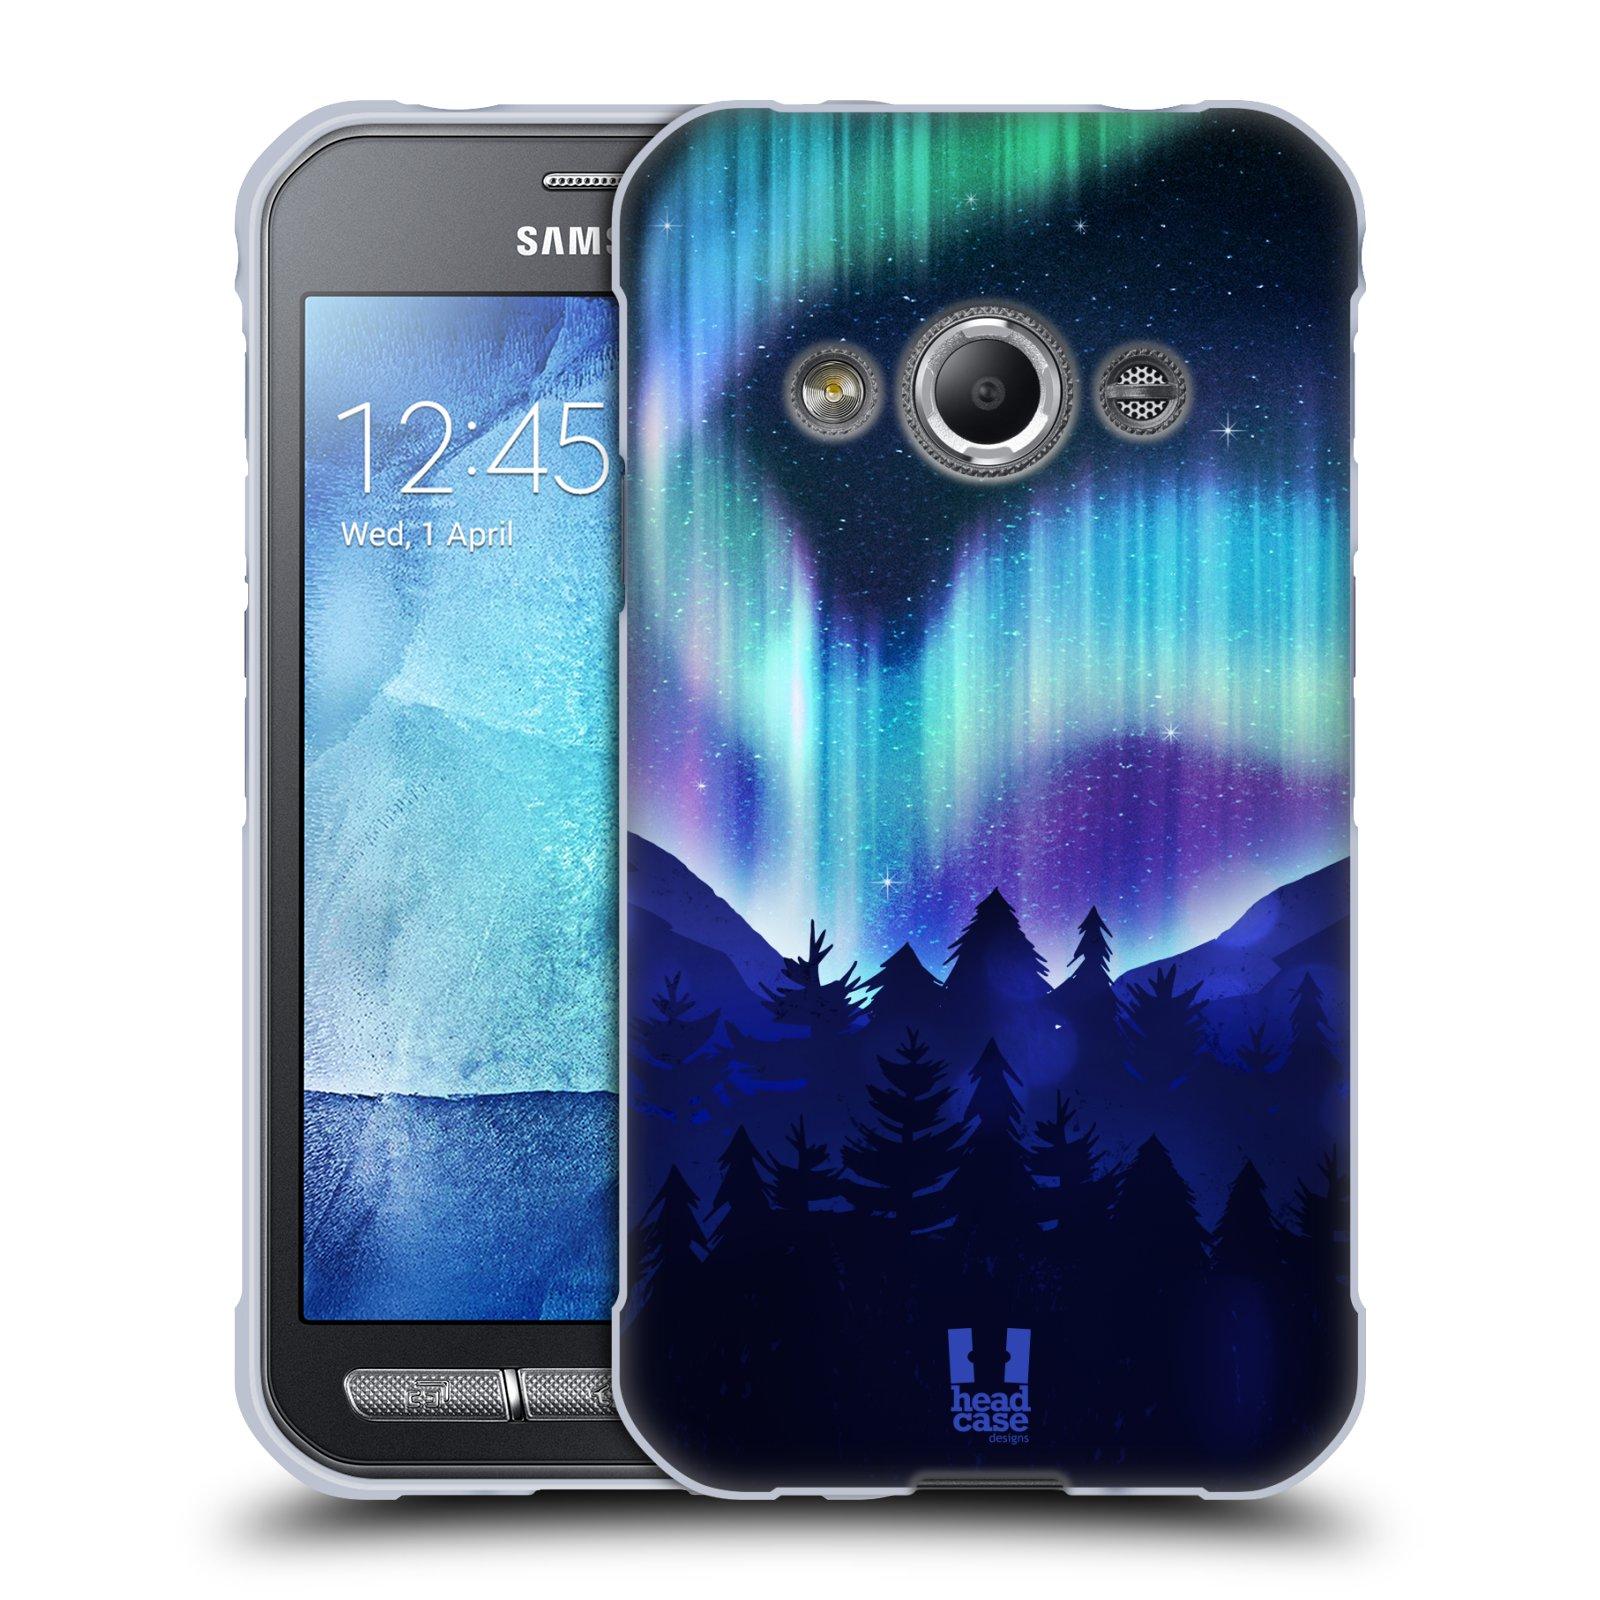 Silikonové pouzdro na mobil Samsung Galaxy Xcover 3 HEAD CASE Polární Záře Borovice (Silikonový kryt či obal na mobilní telefon Samsung Galaxy Xcover 3 SM-G388F)